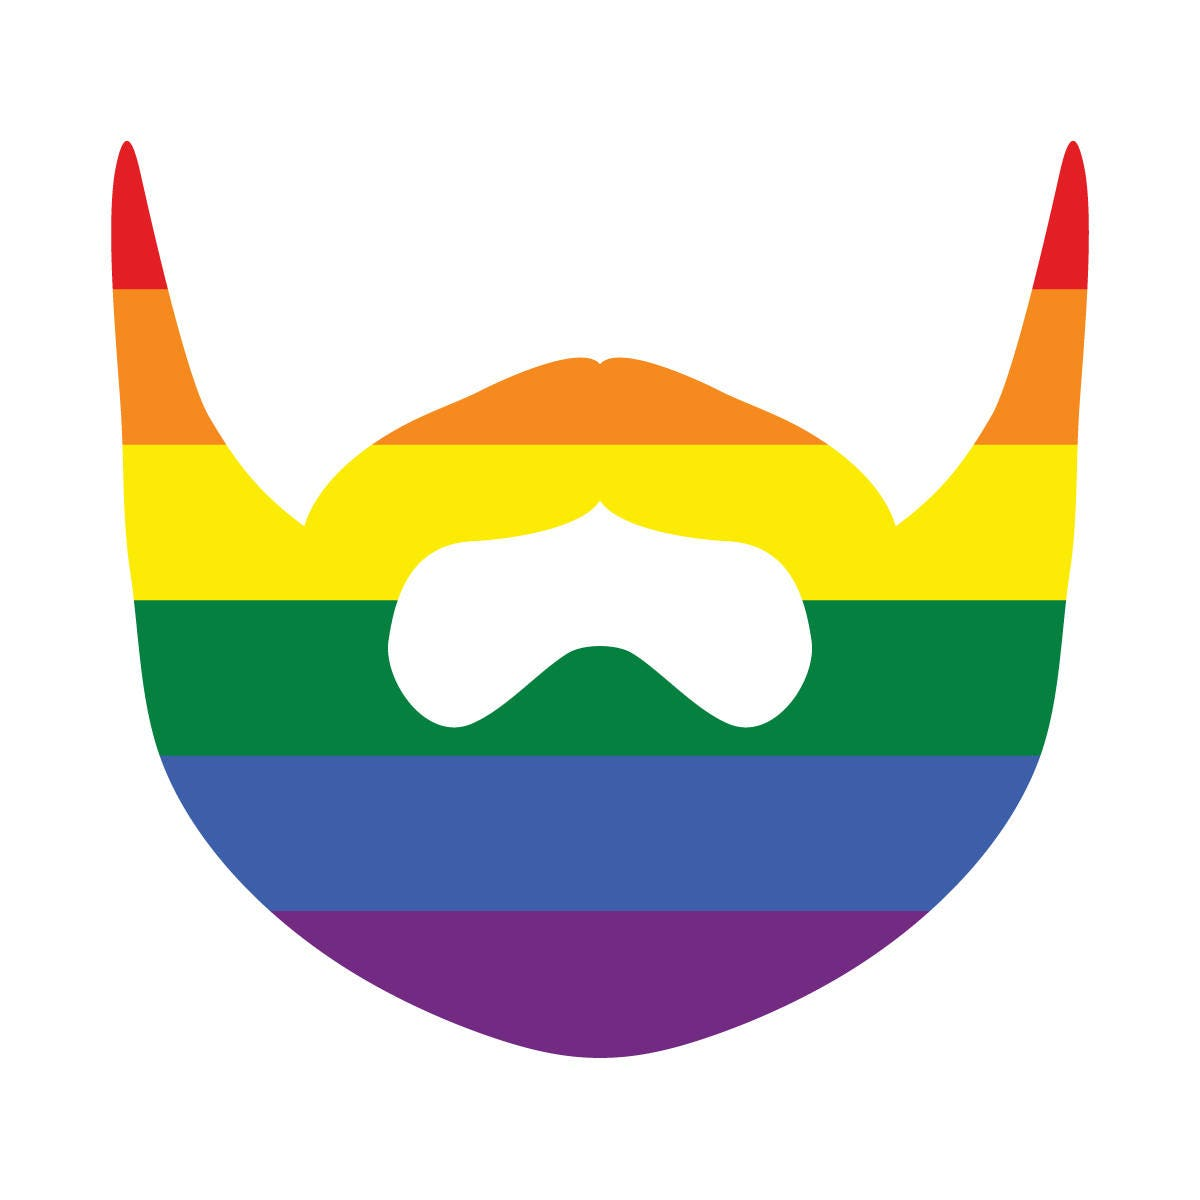 Pride flag colored beard lgbt rights gay lesbian bi transgender pride flag colored beard lgbt rights gay lesbian bi transgender unity love support pride symbol vibrant color vinyl decal buycottarizona